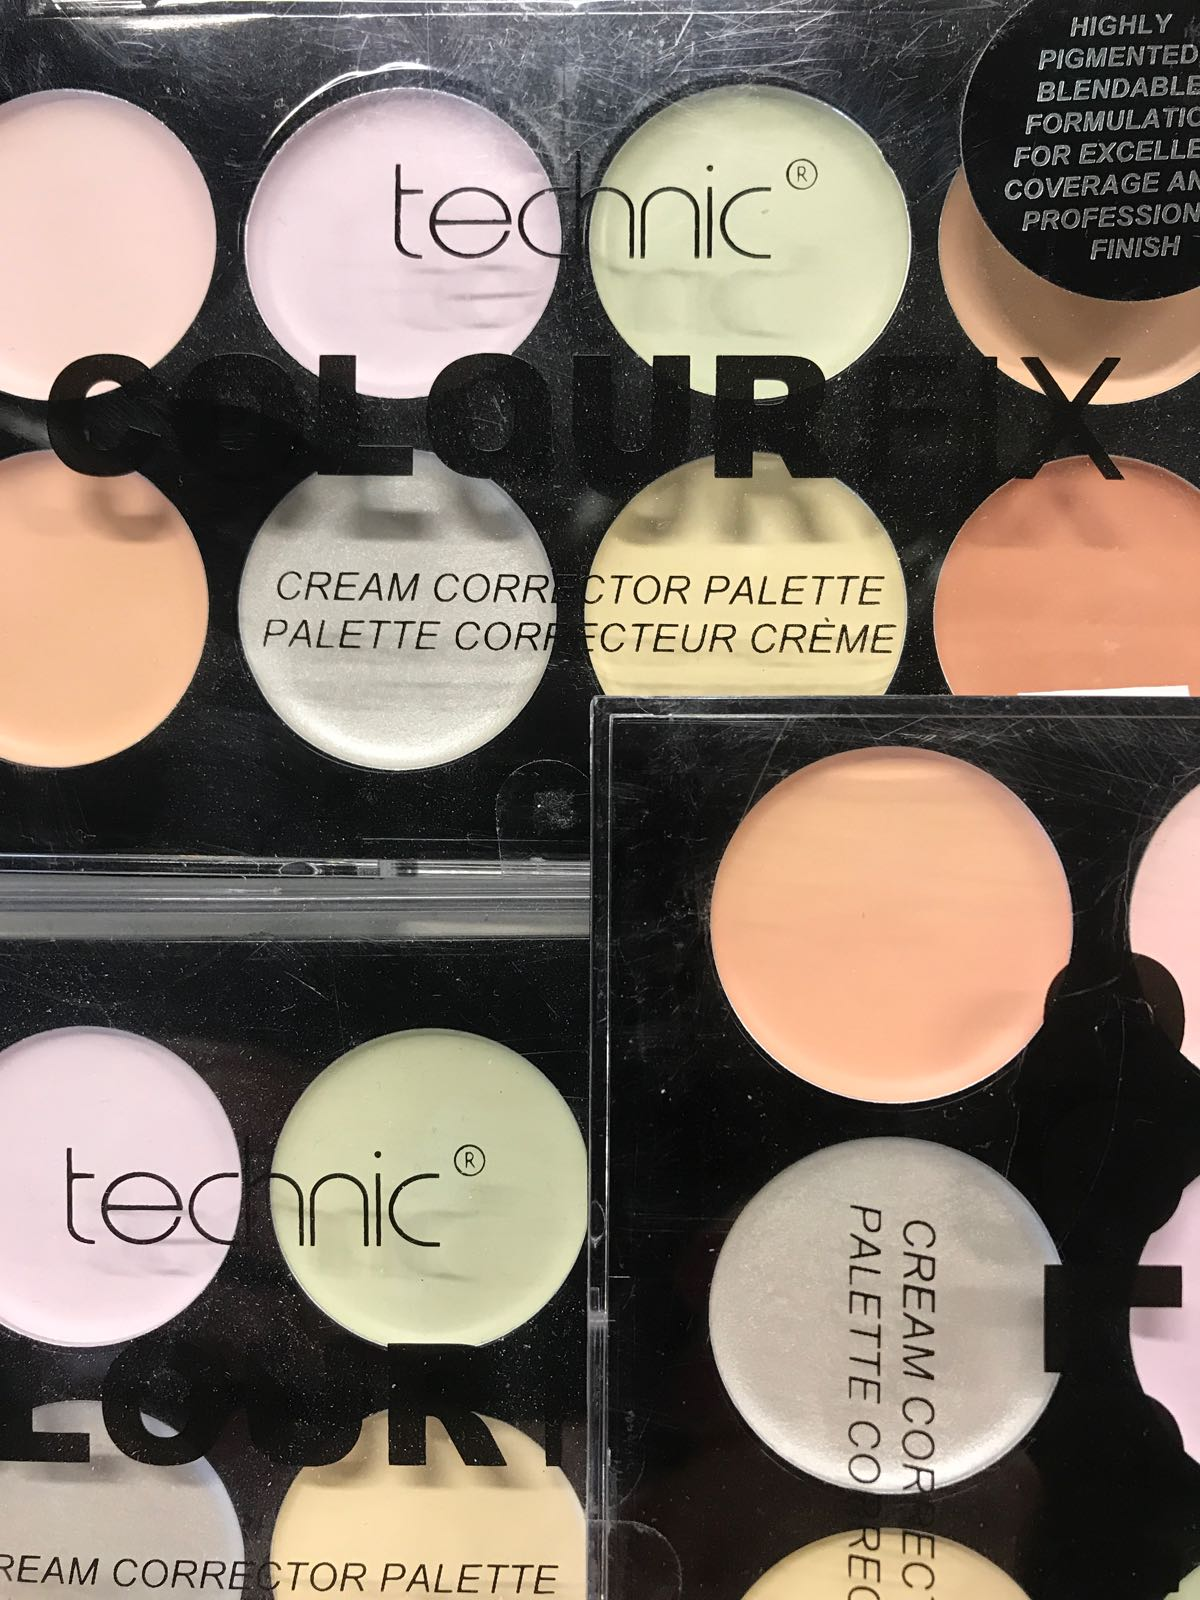 Cream Corrector palette